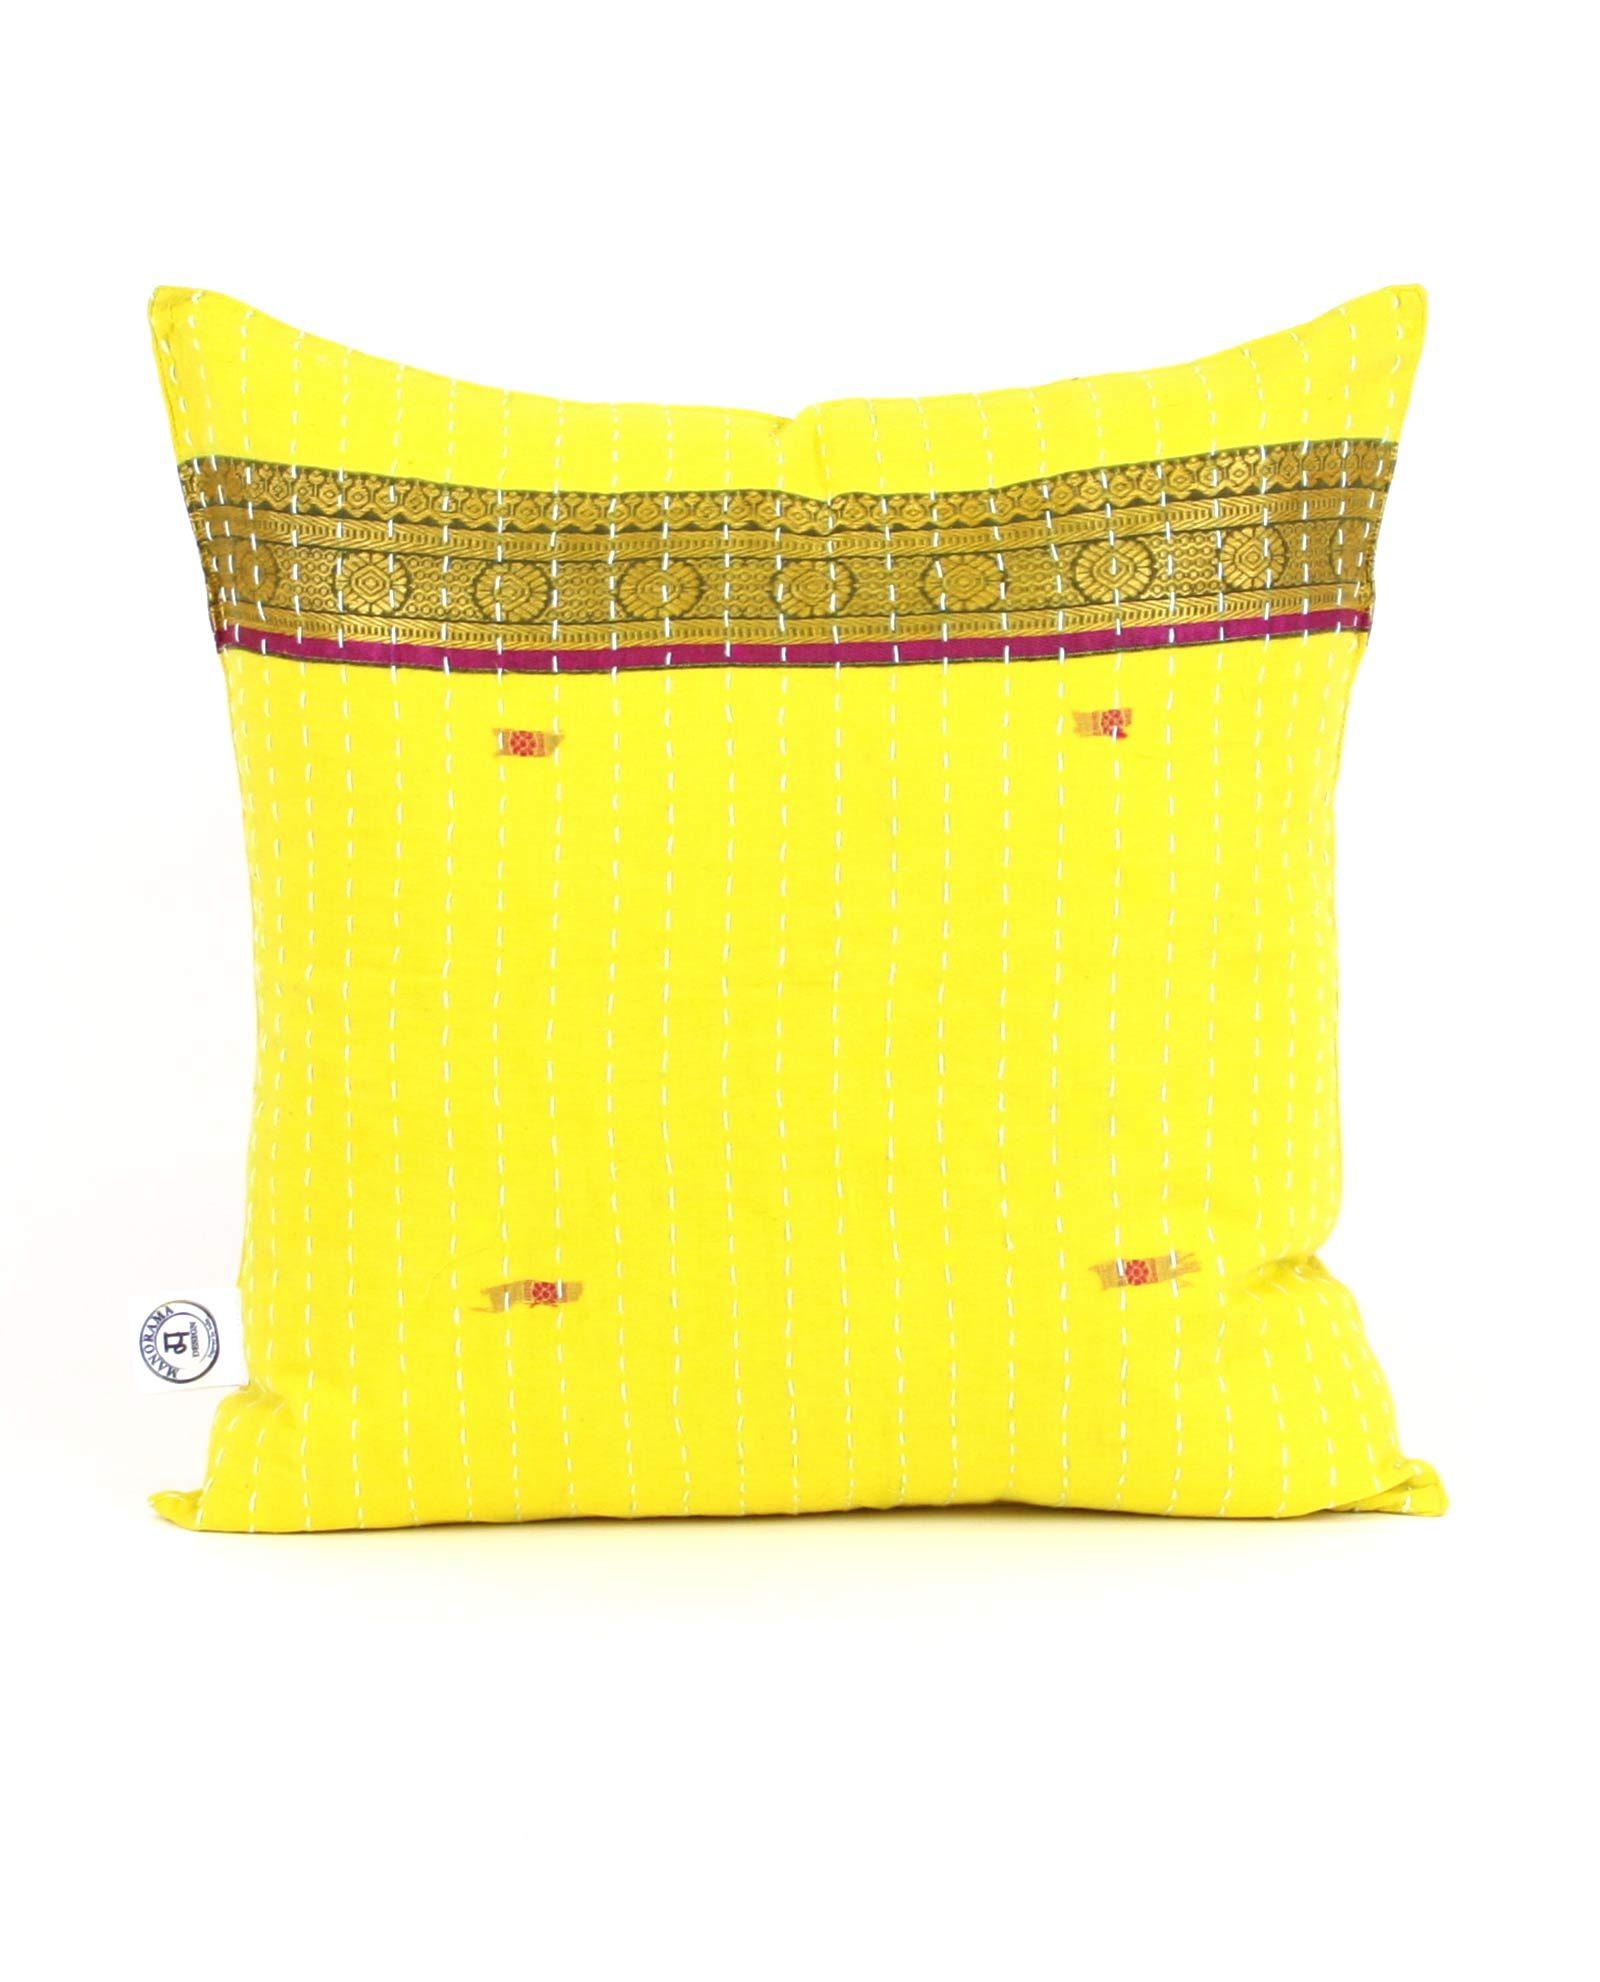 Indisk kudde- handquiltad- gul, unik design, inredning